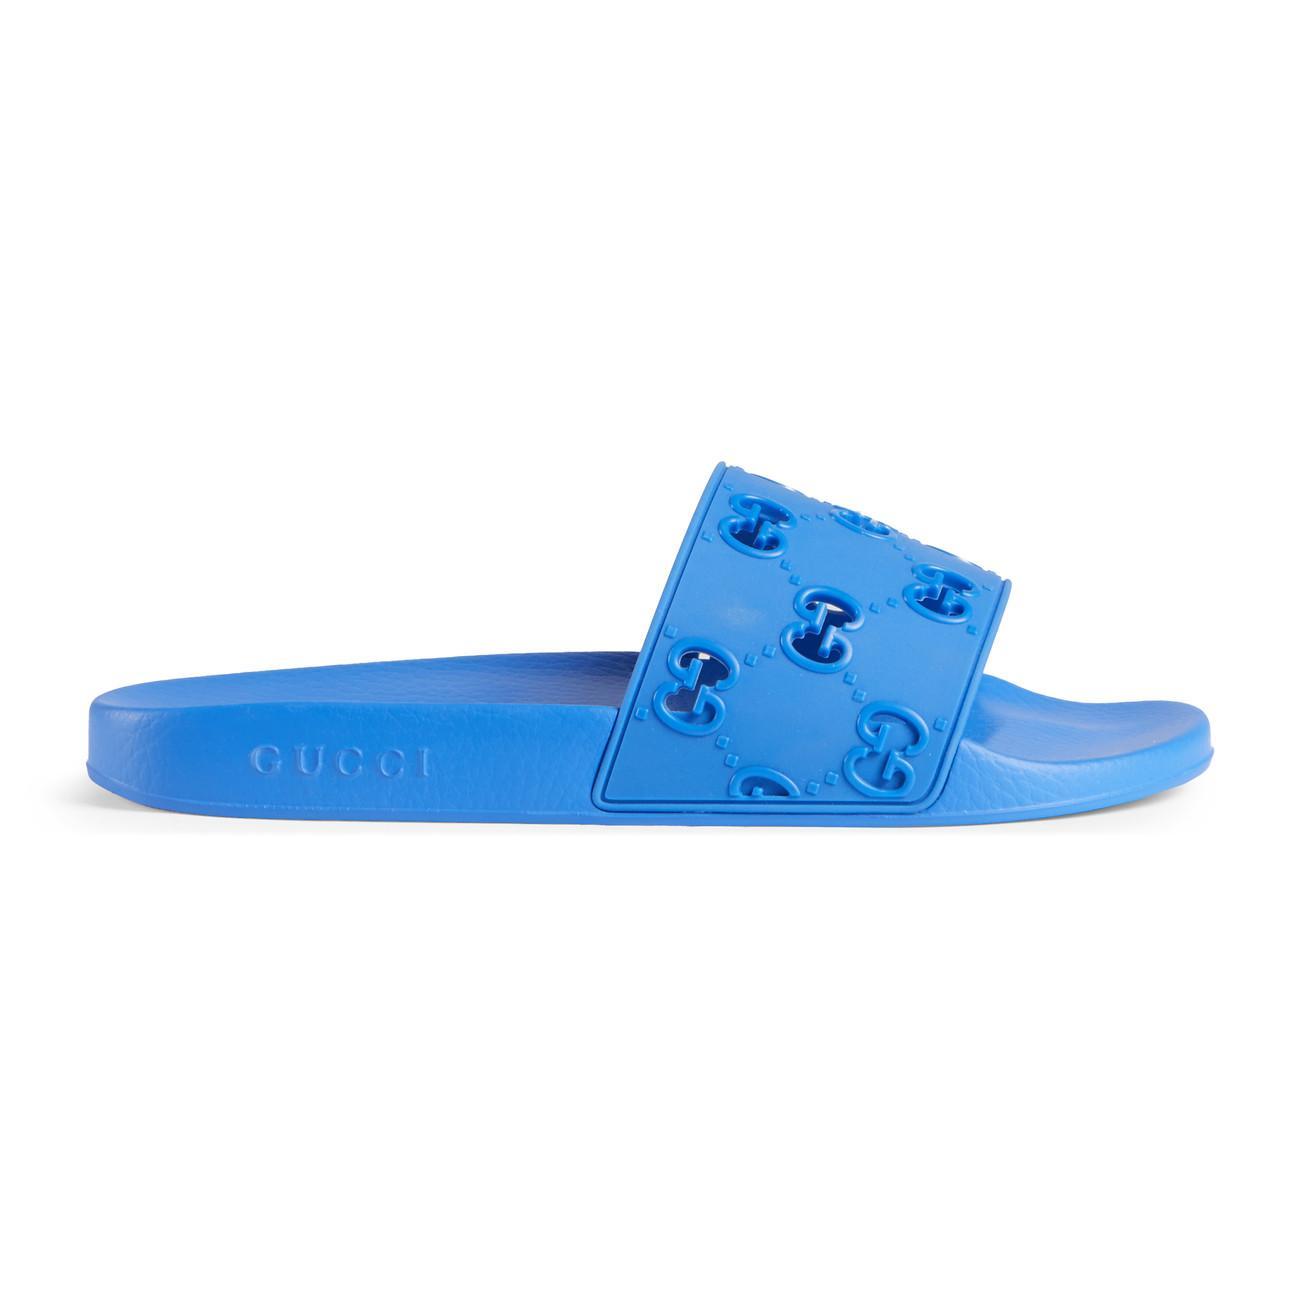 2a3b7e58ddd Lyst - Gucci Men s Rubber GG Slide Sandal in Blue for Men